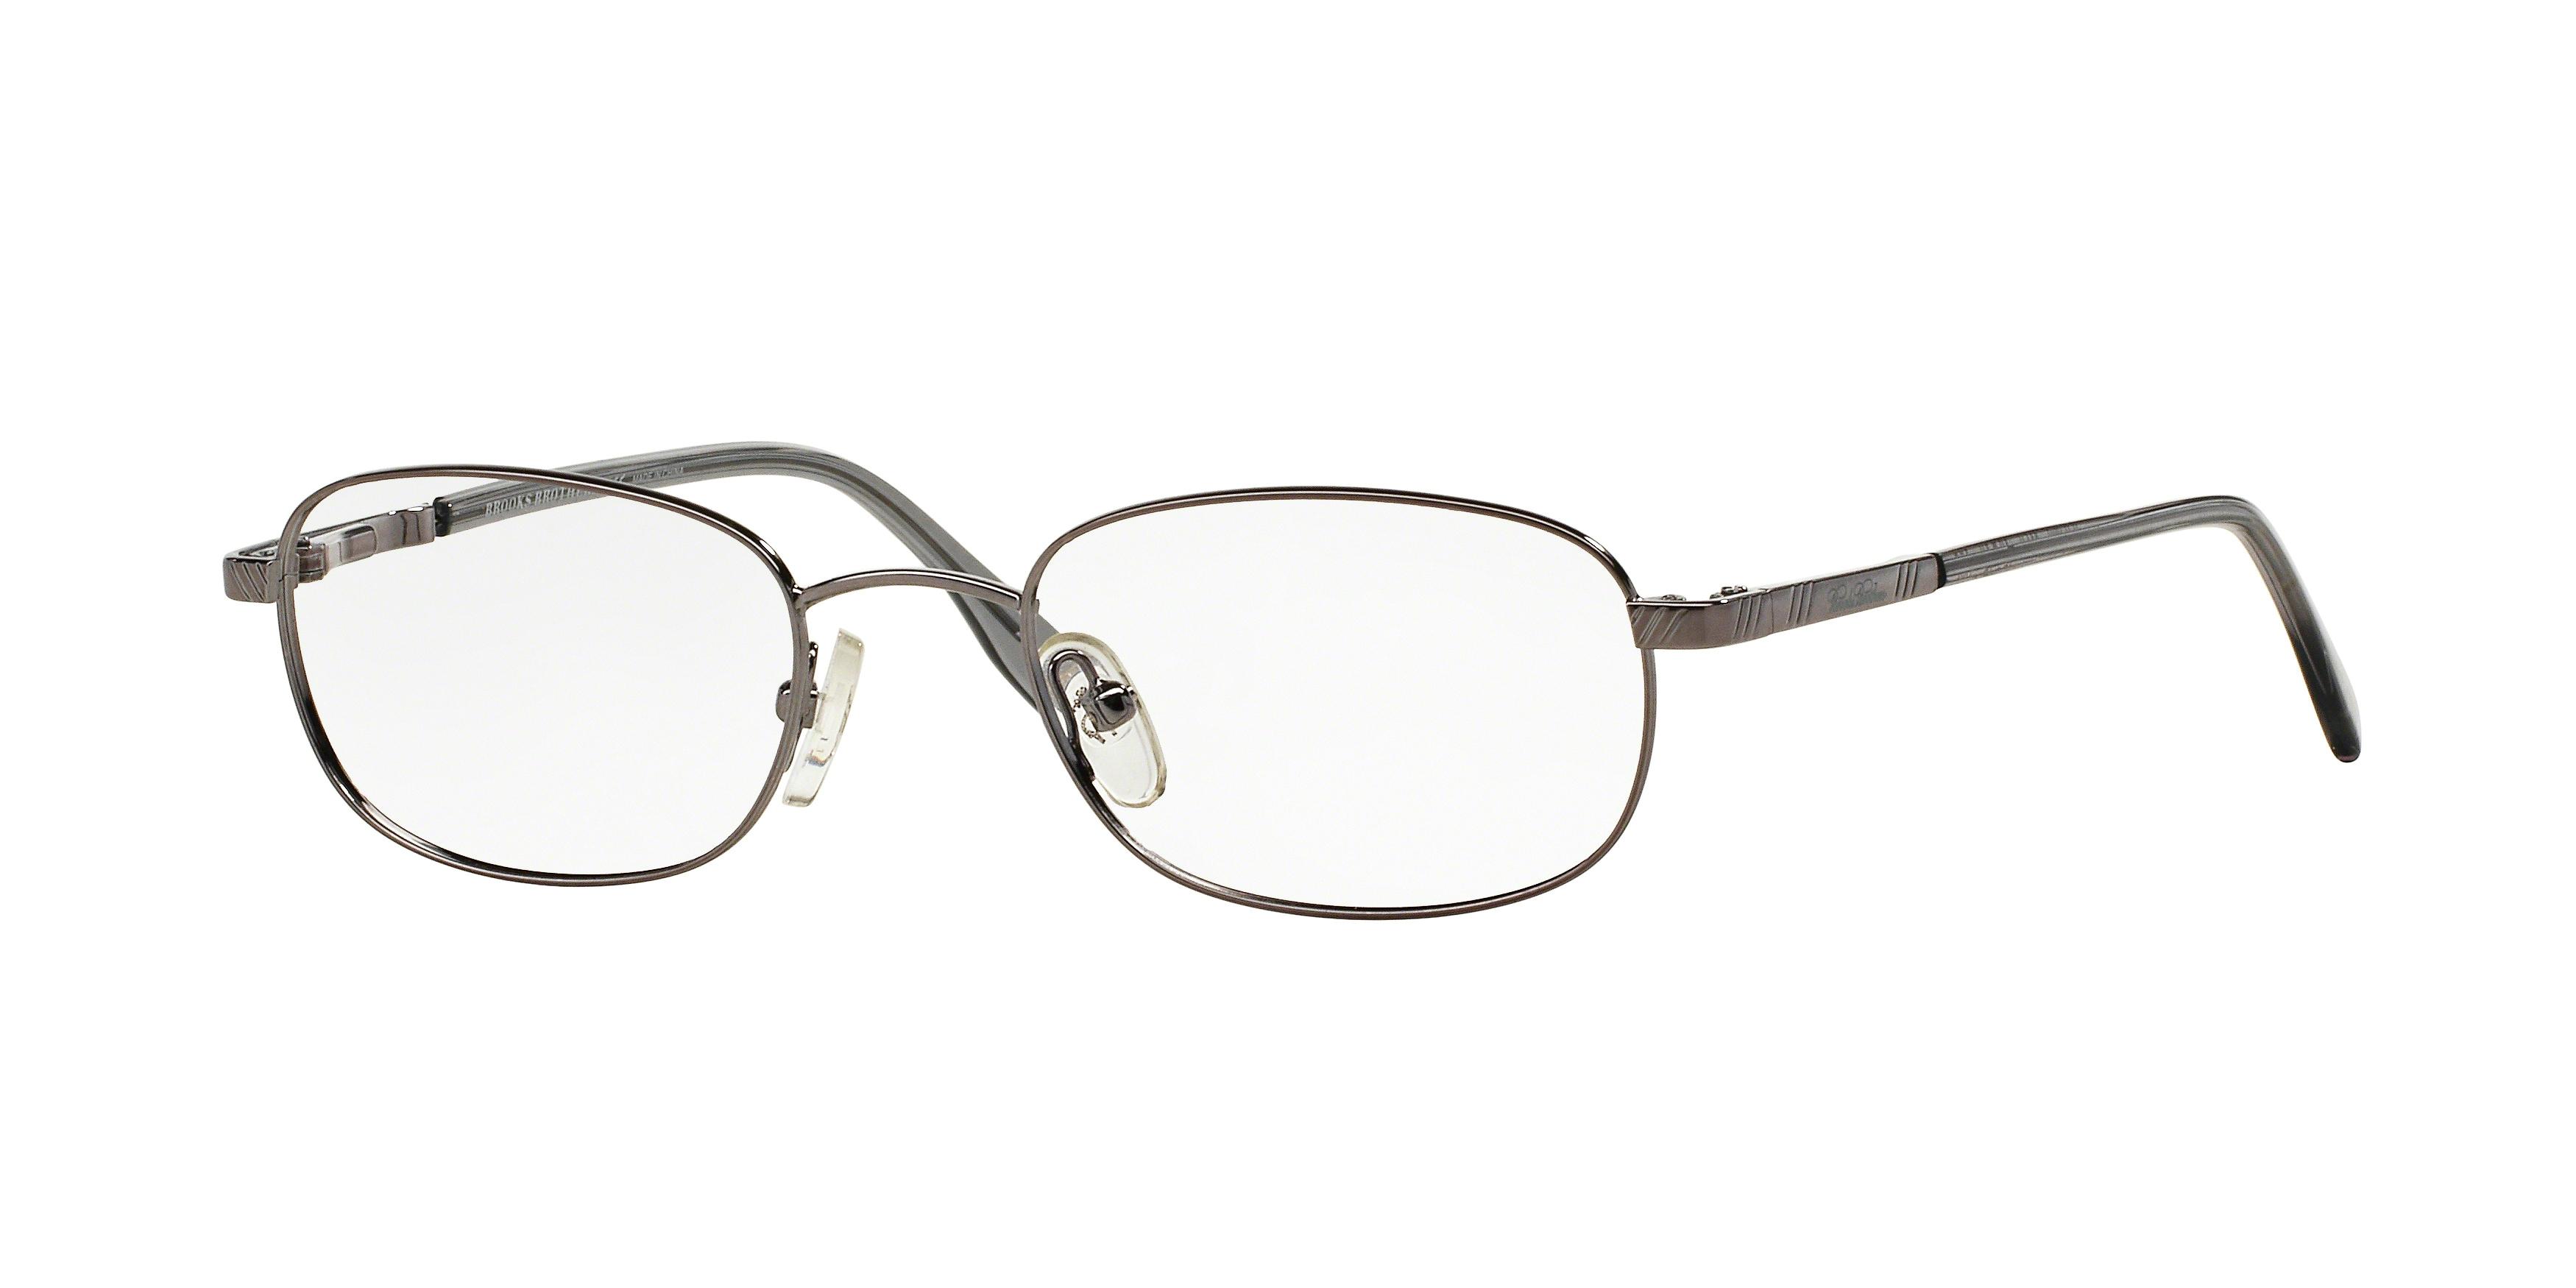 6292b0c0c6c1 Brooks Brothers Eyeglass Frames BB363 | 5 Star Rating w/ Free Shipping